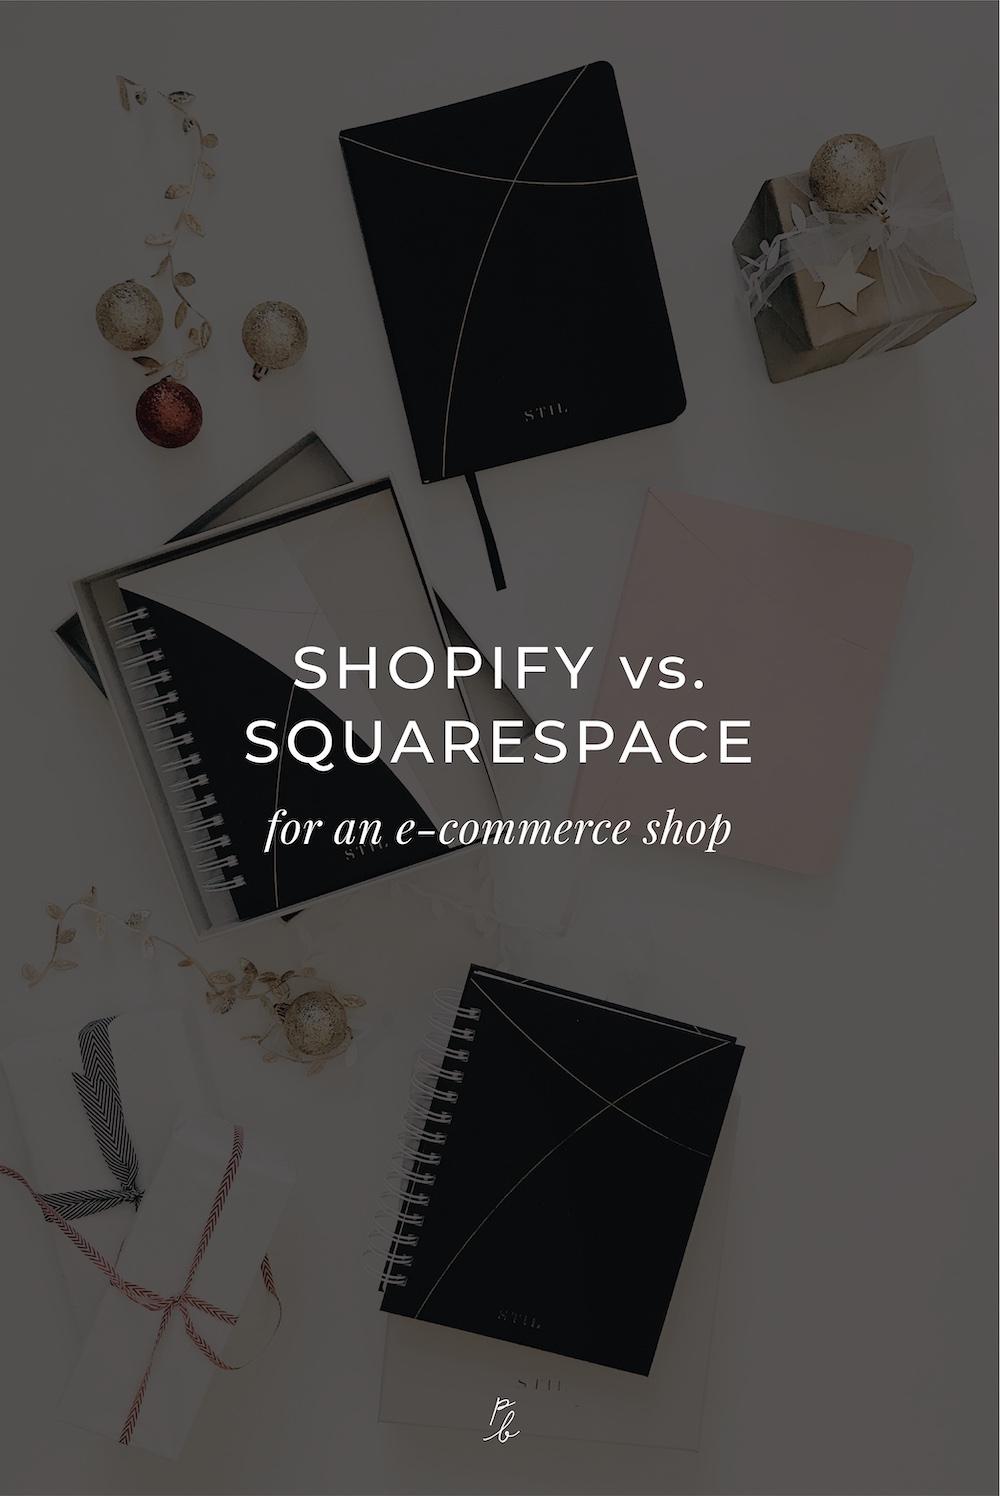 Shopify vs. Squarespace for an e-commerce shop.jpg